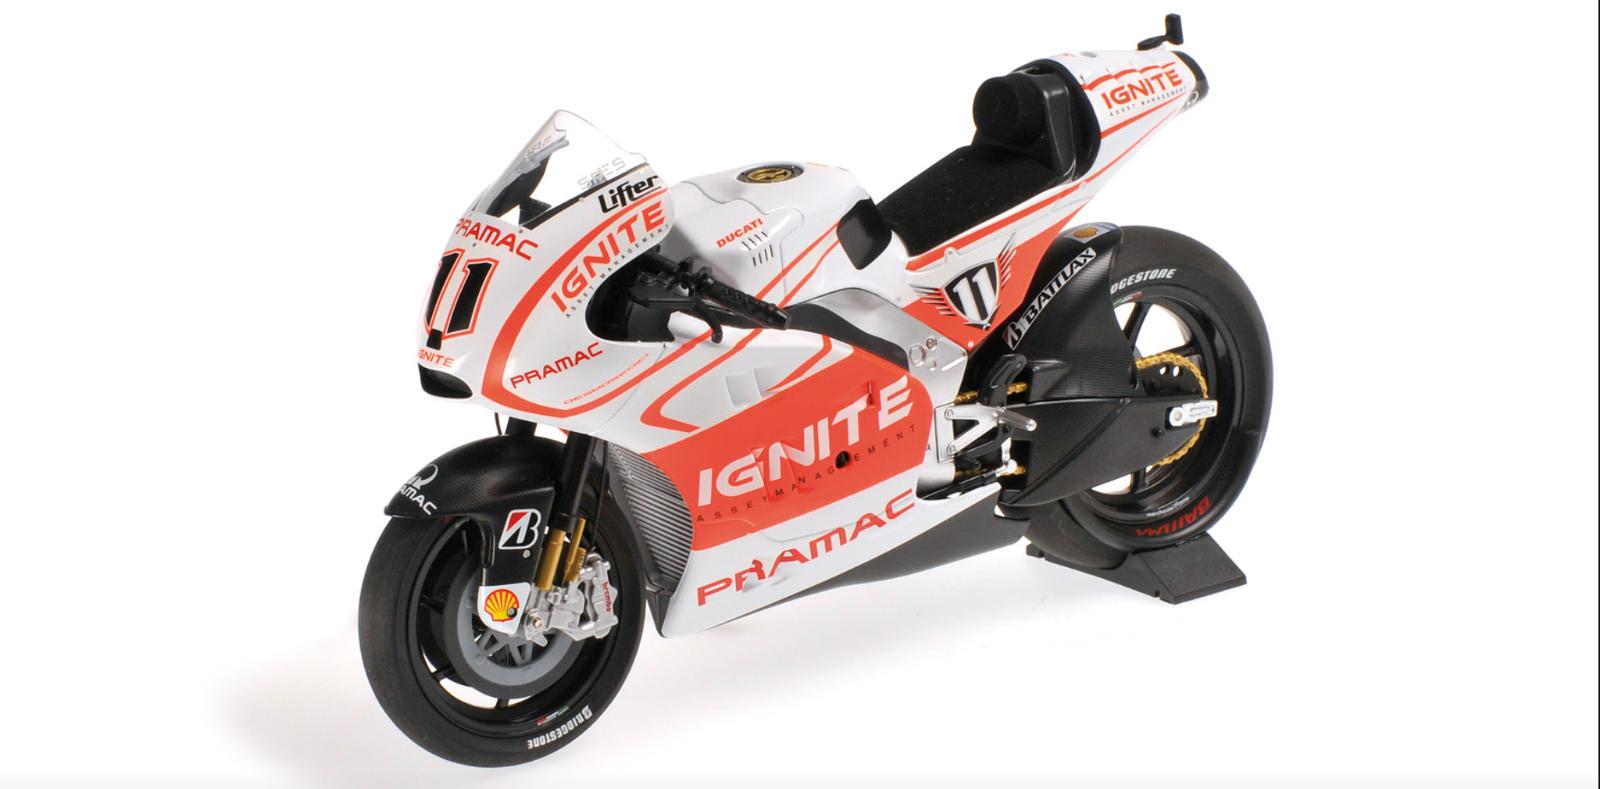 1 12 Ducati Desmosedici GP13 Spies MotoGP 2013 1 12 • Minichamps 122130011